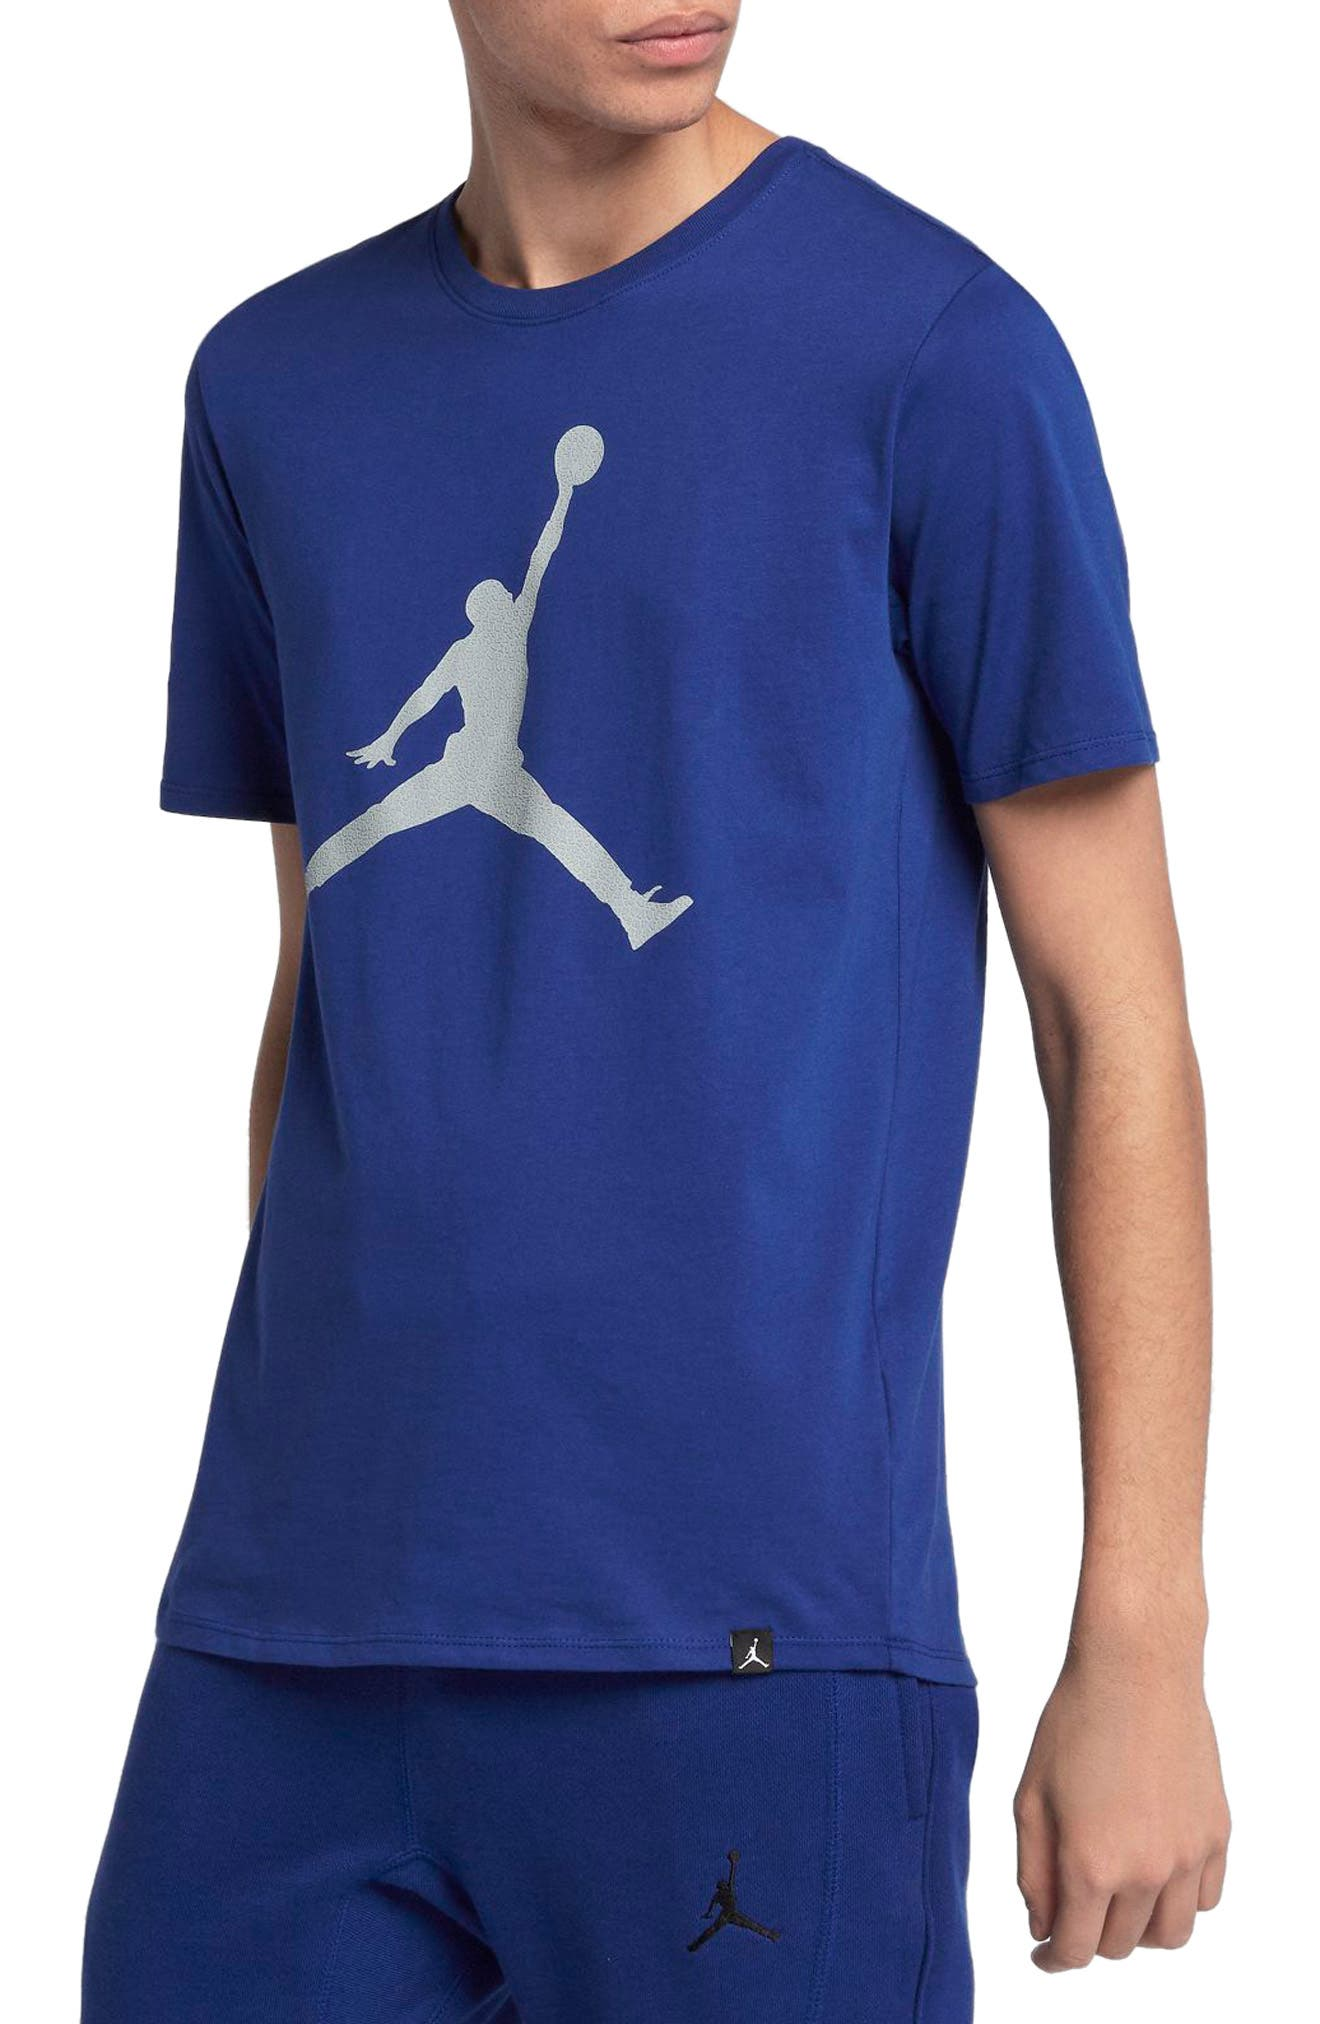 Sportswear Iconic Jumpman T-Shirt,                             Main thumbnail 1, color,                             Deep Royal Blue/ Wolf Grey